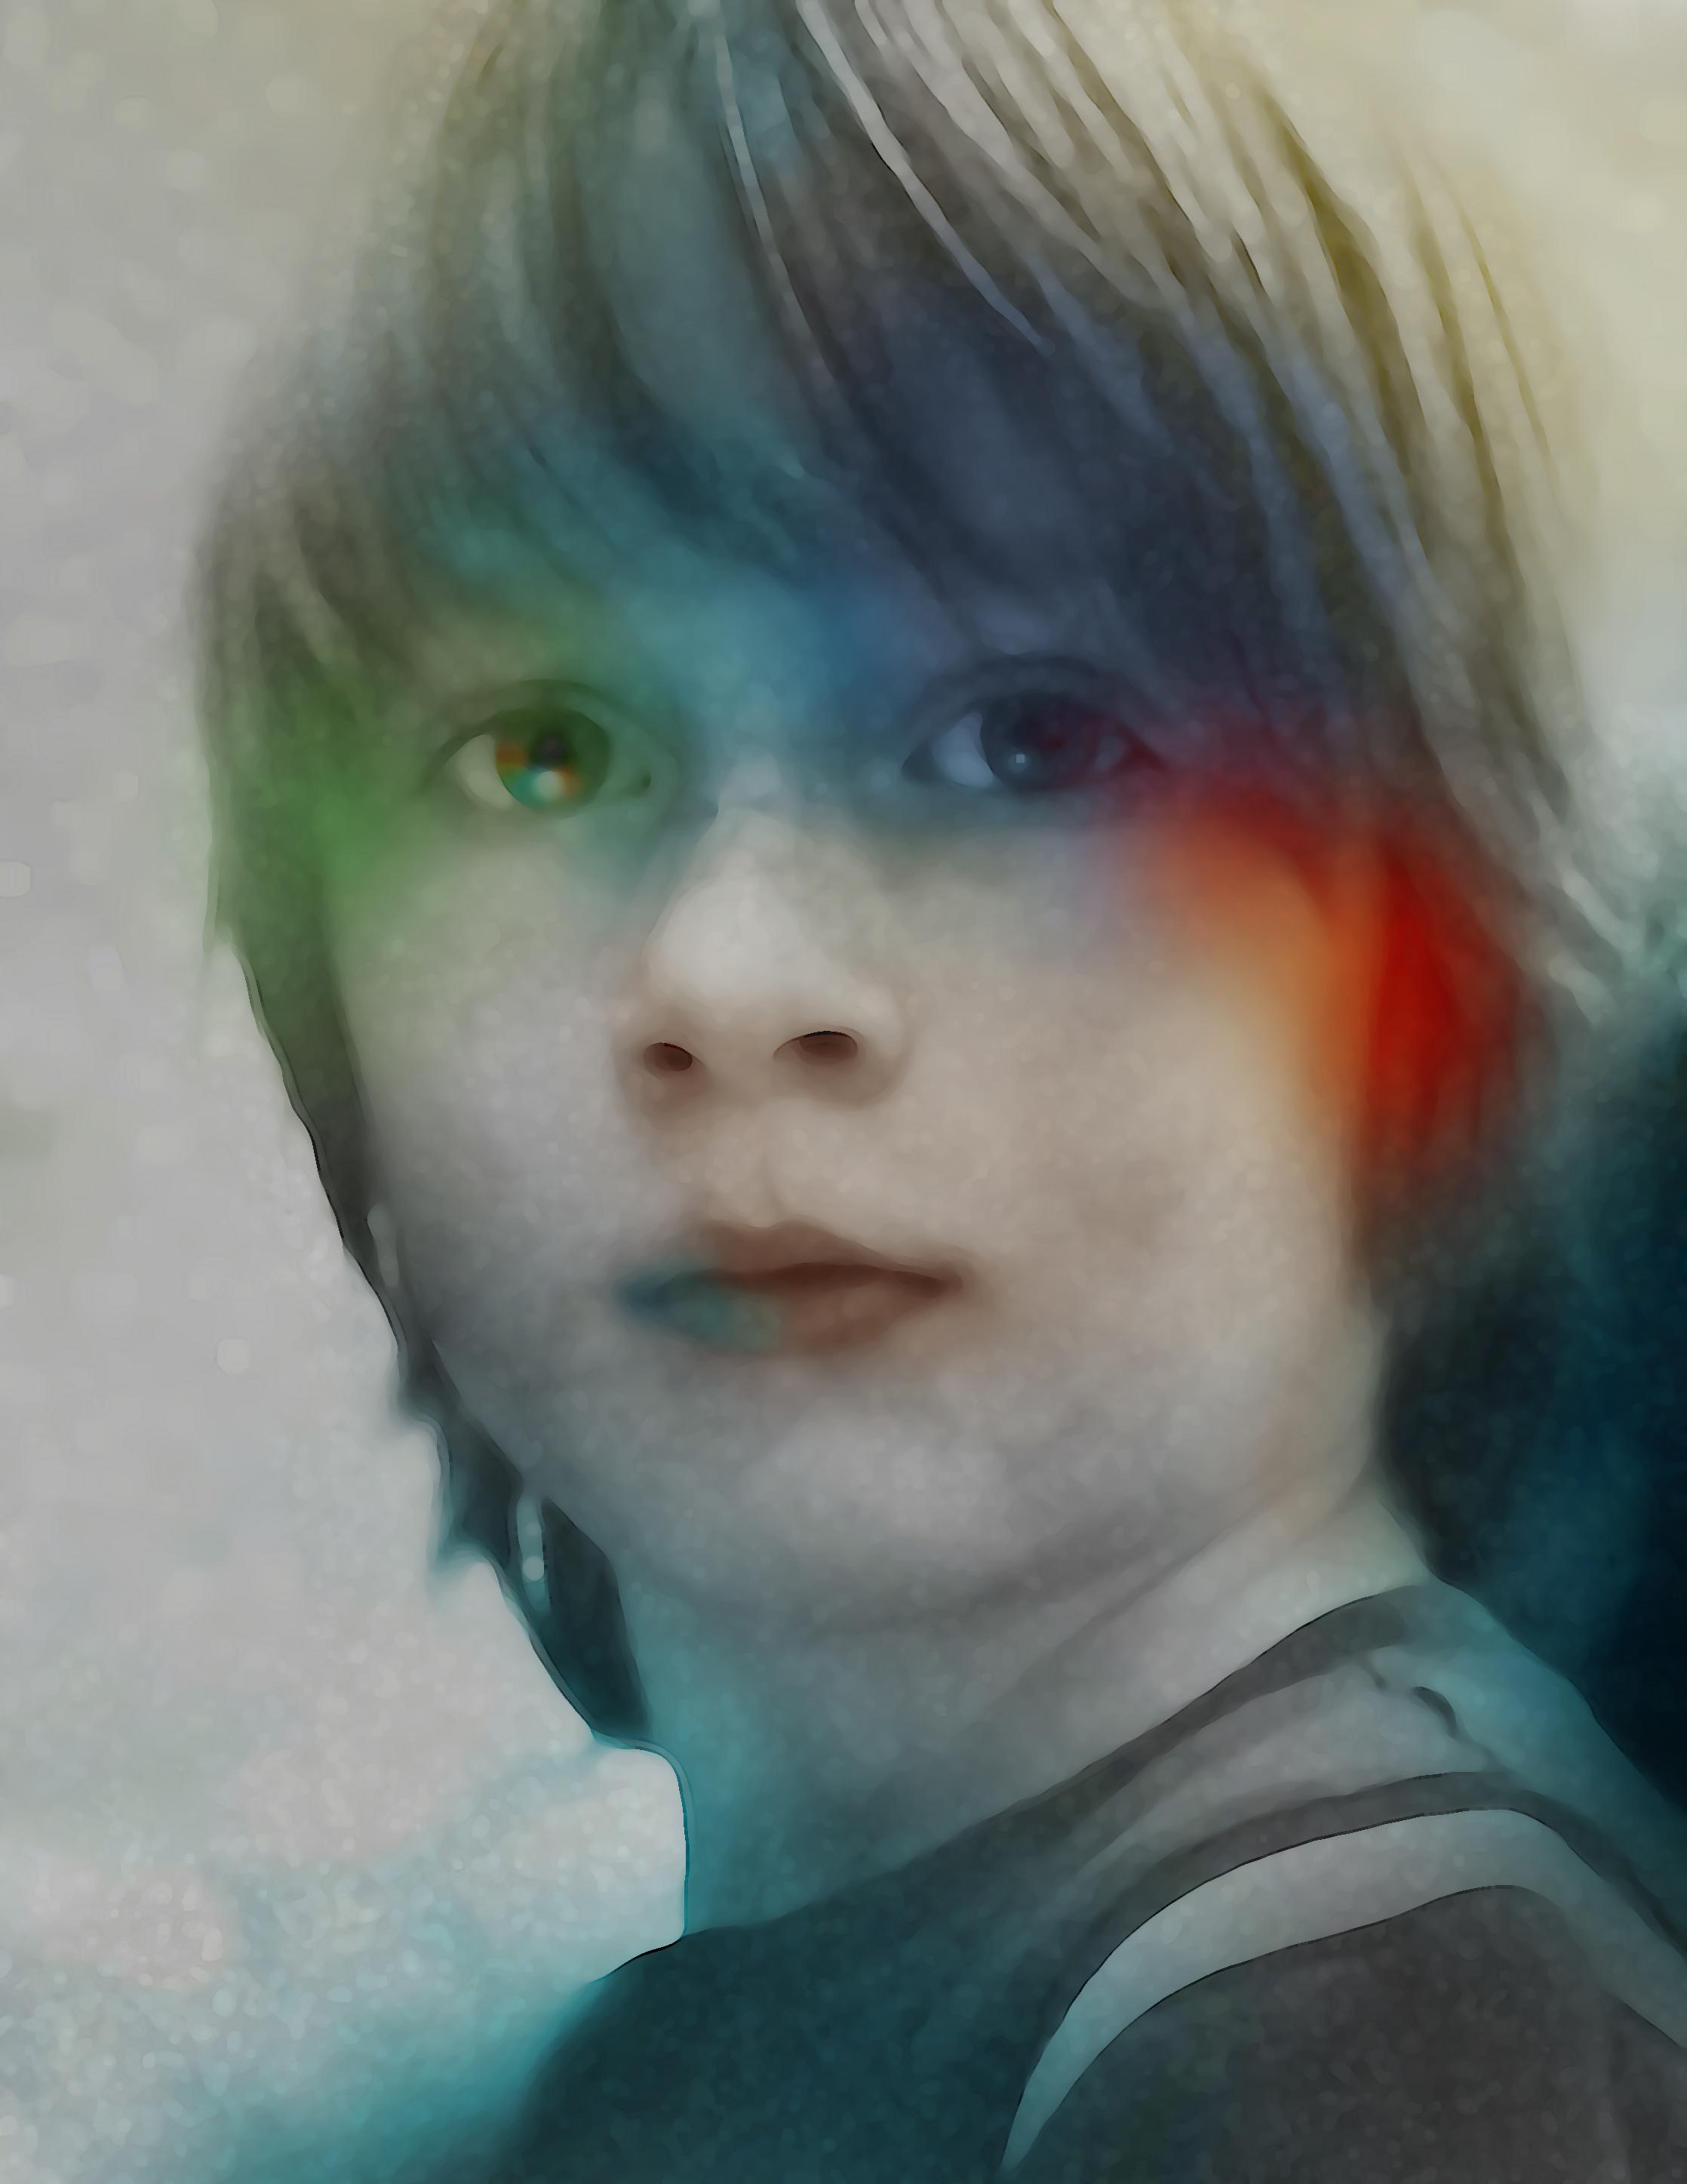 my friend's son